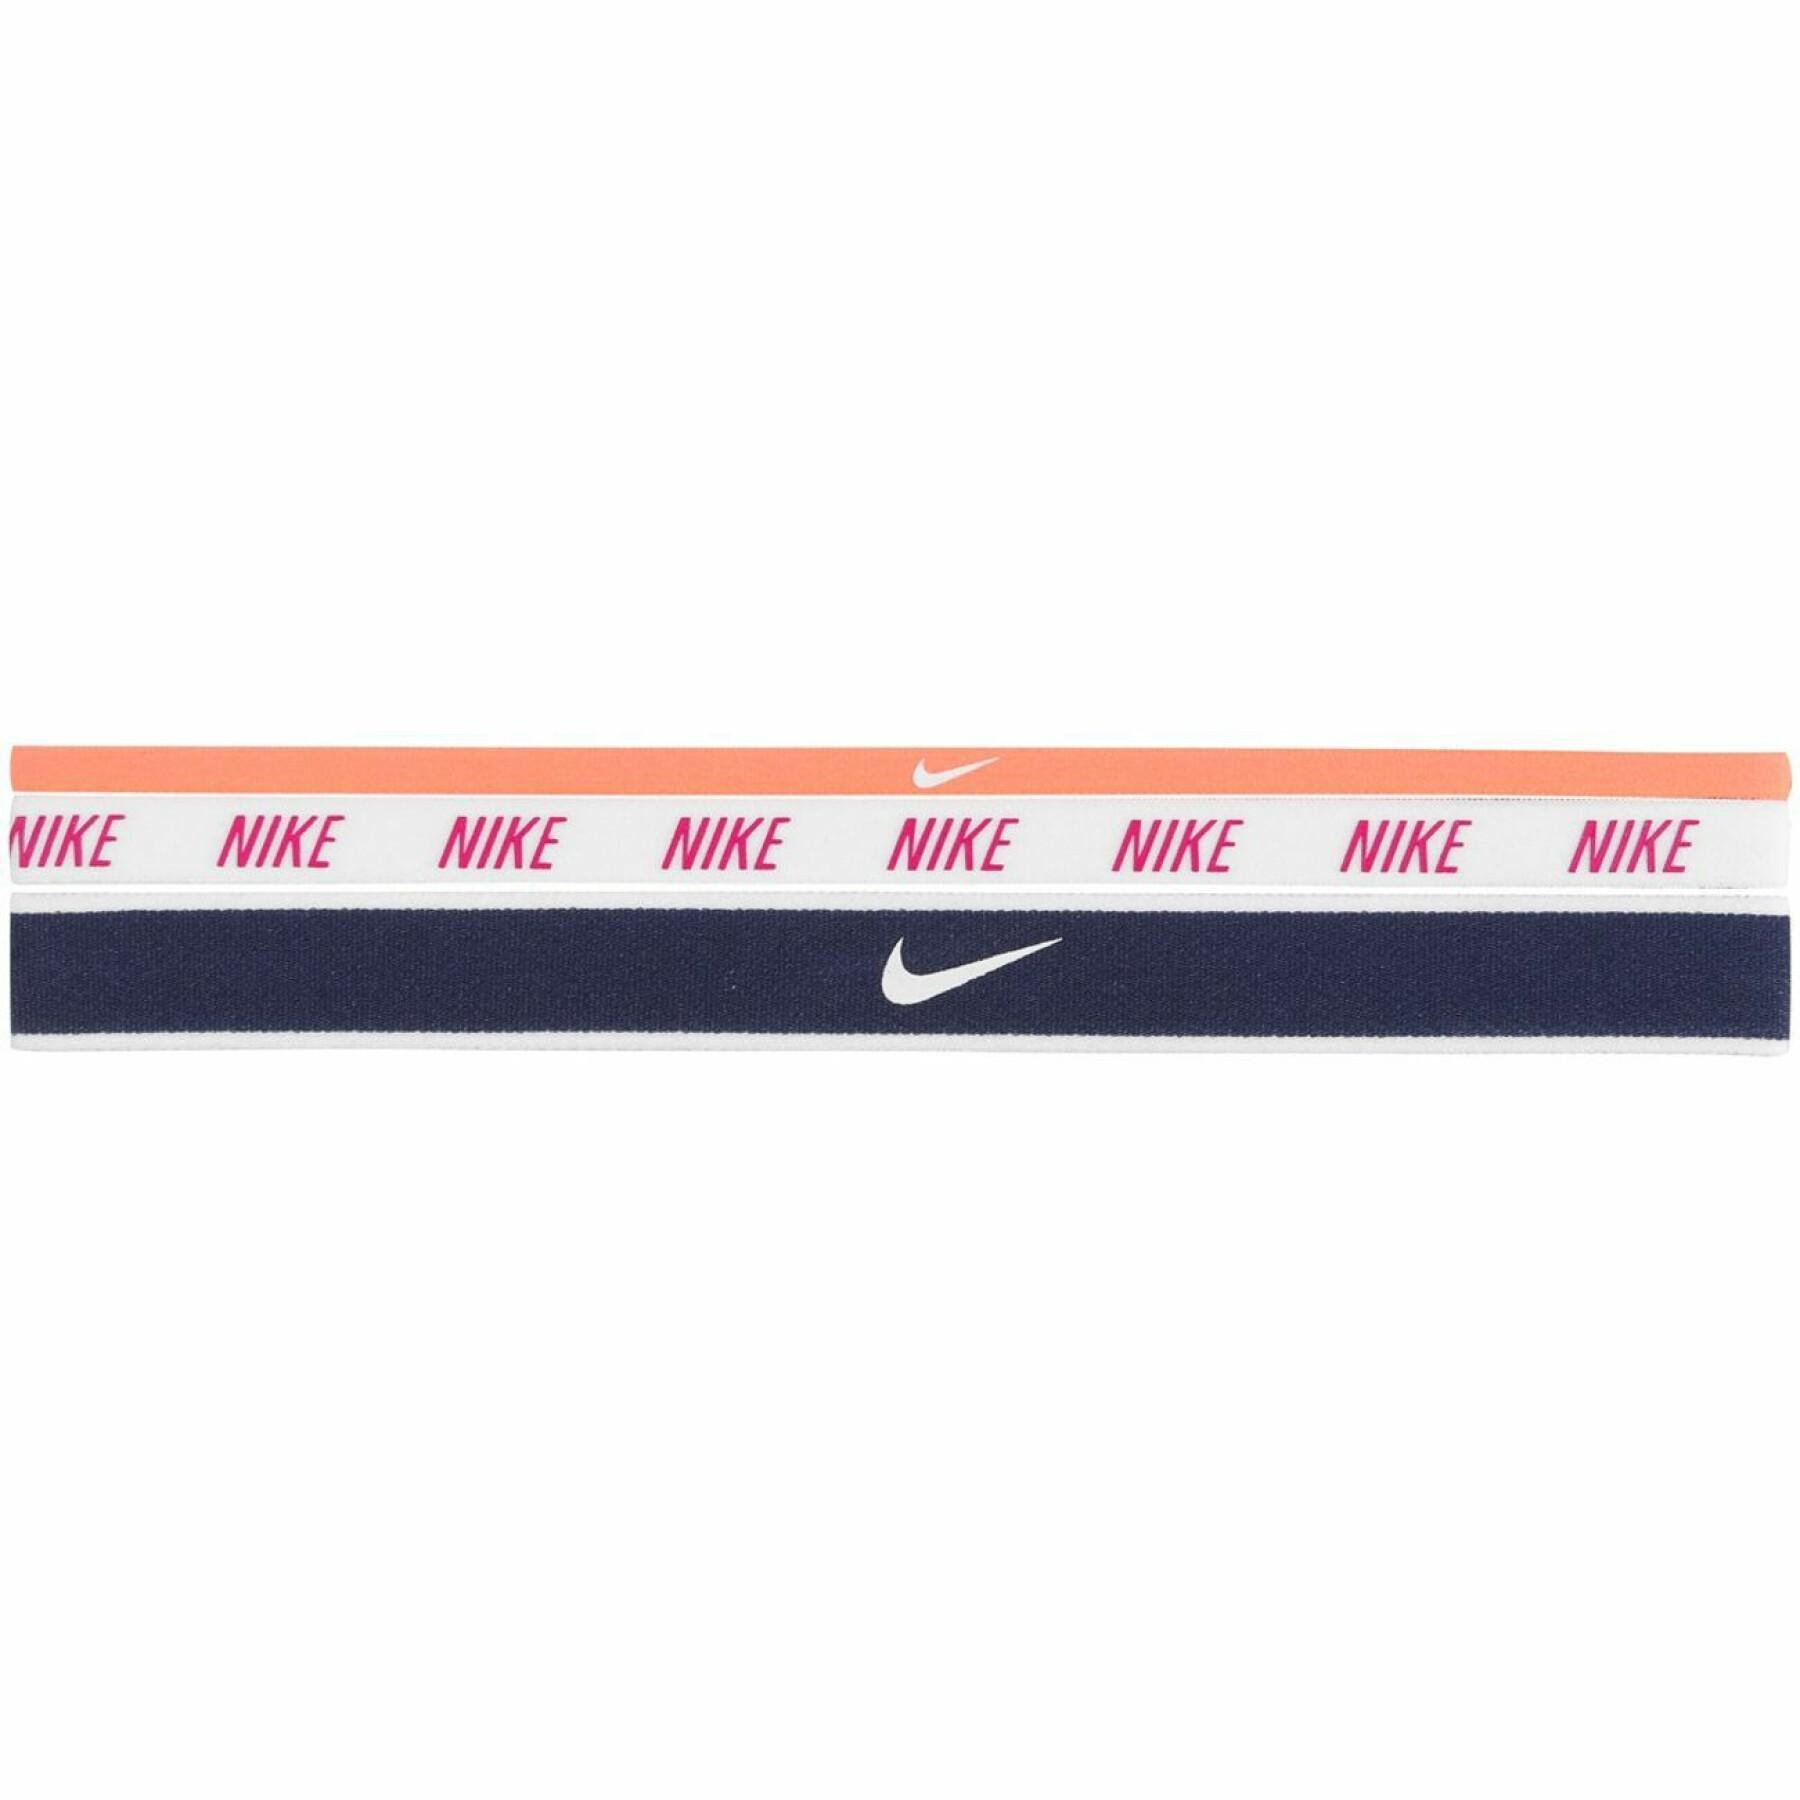 Set of 3 headbands Nike mixed